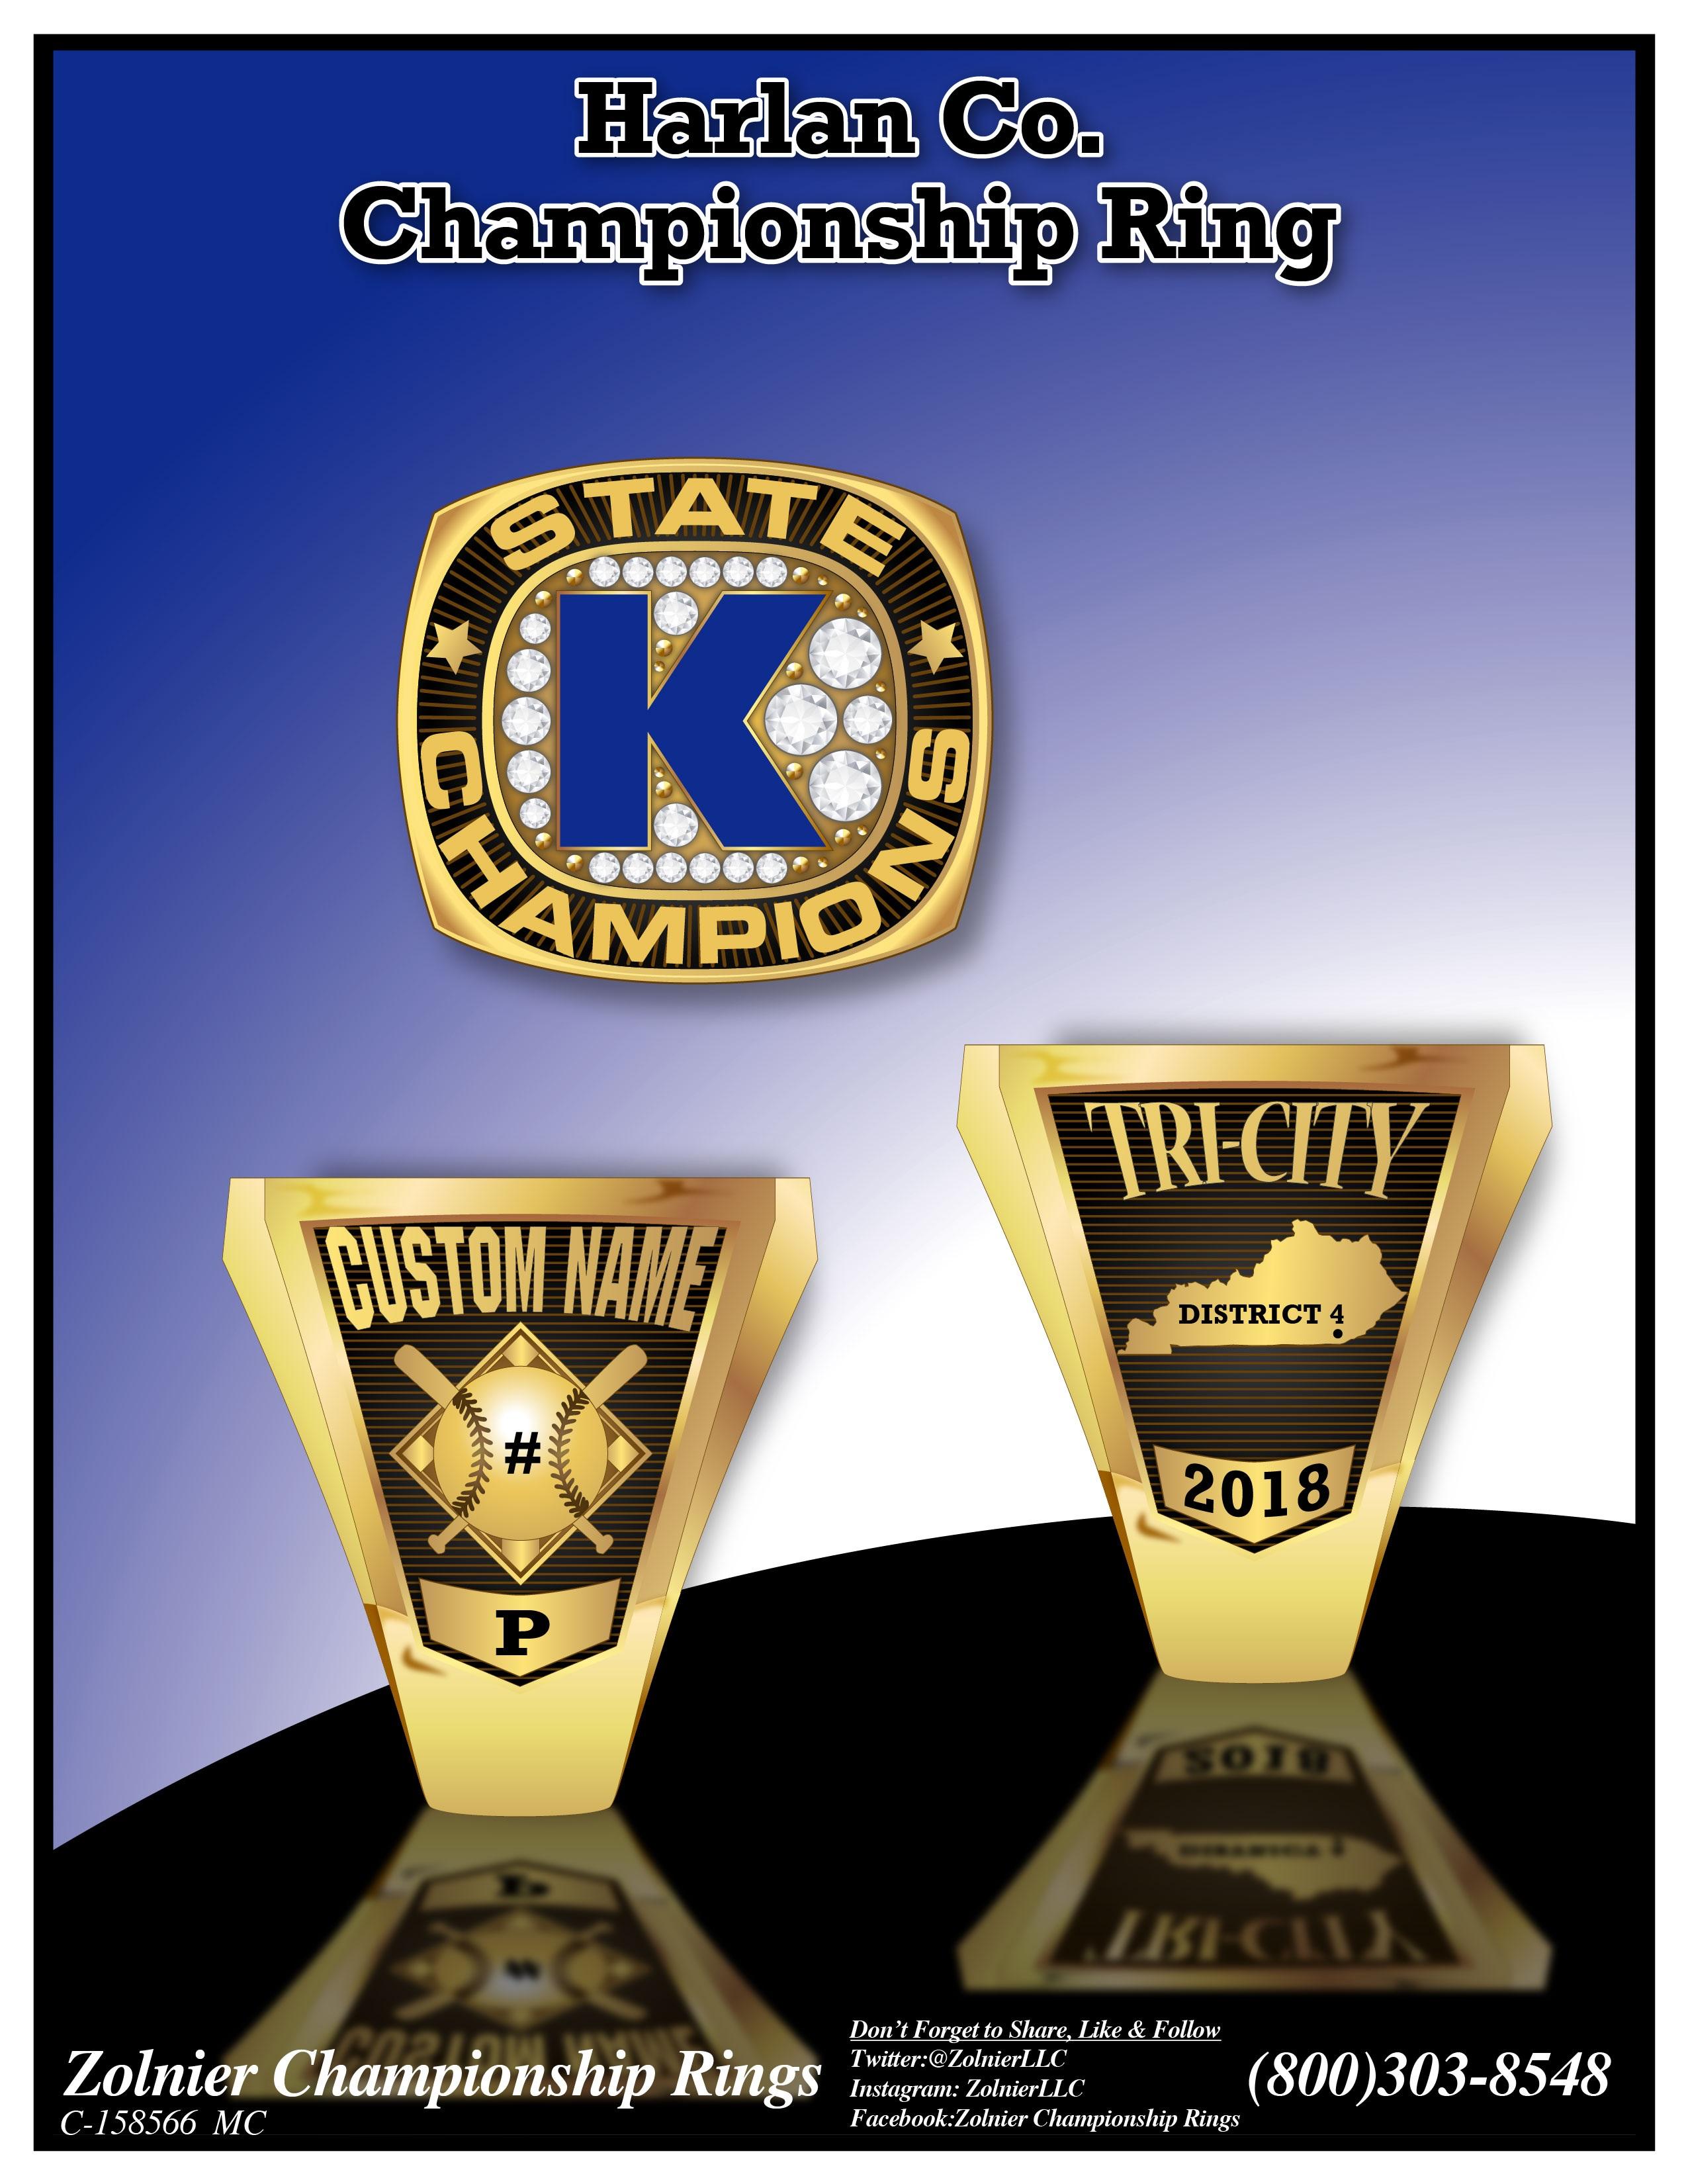 C-158284 Harlan County Champ Ring